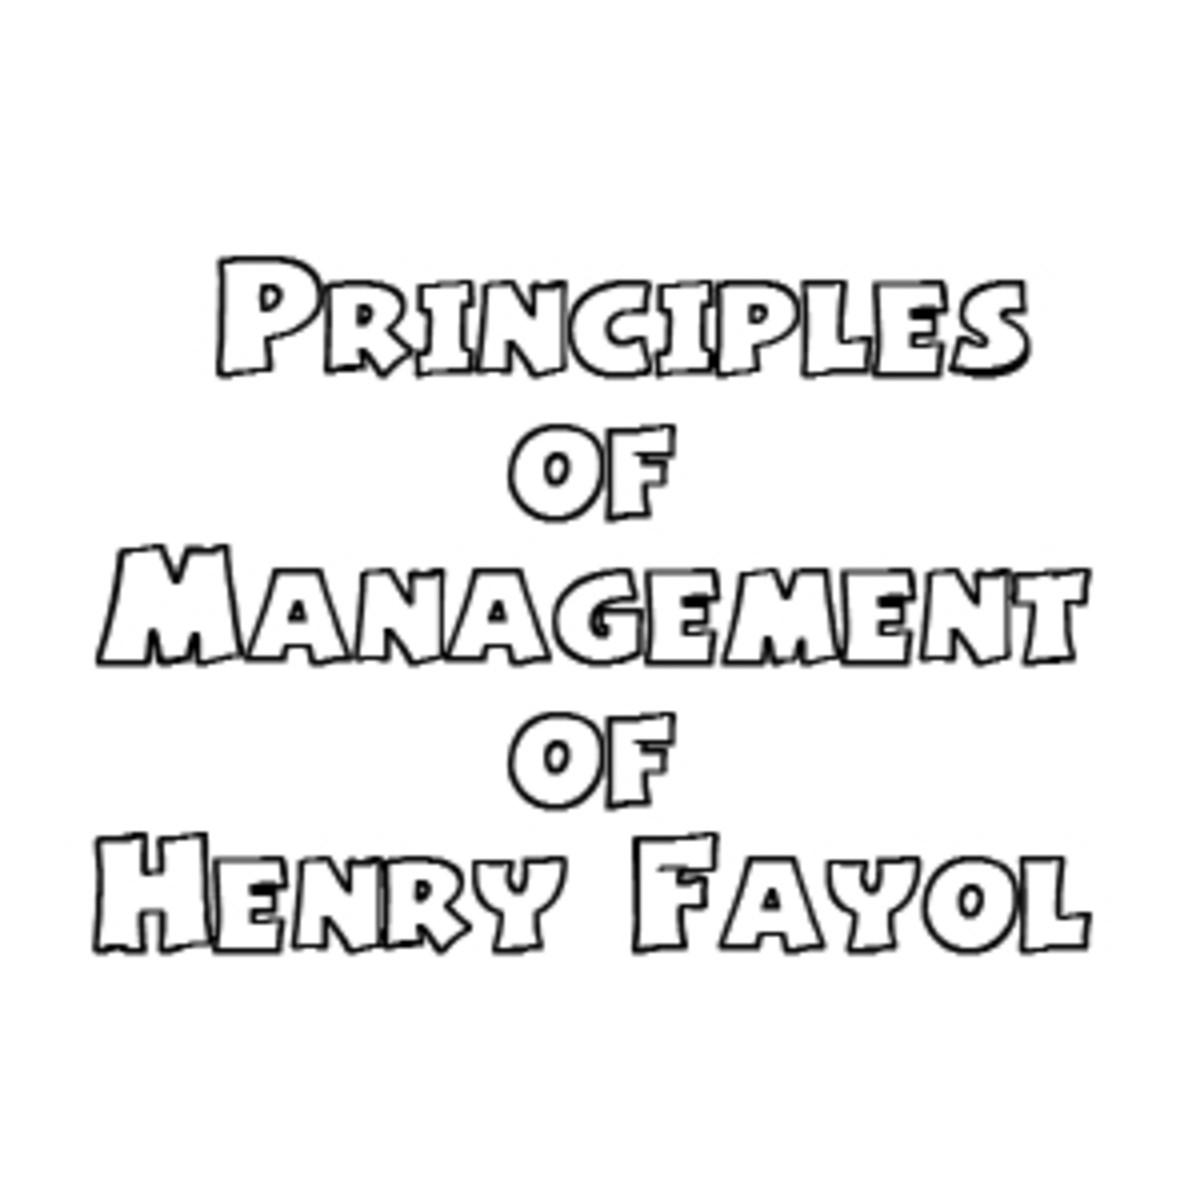 application of henri fayol 14 principles of management